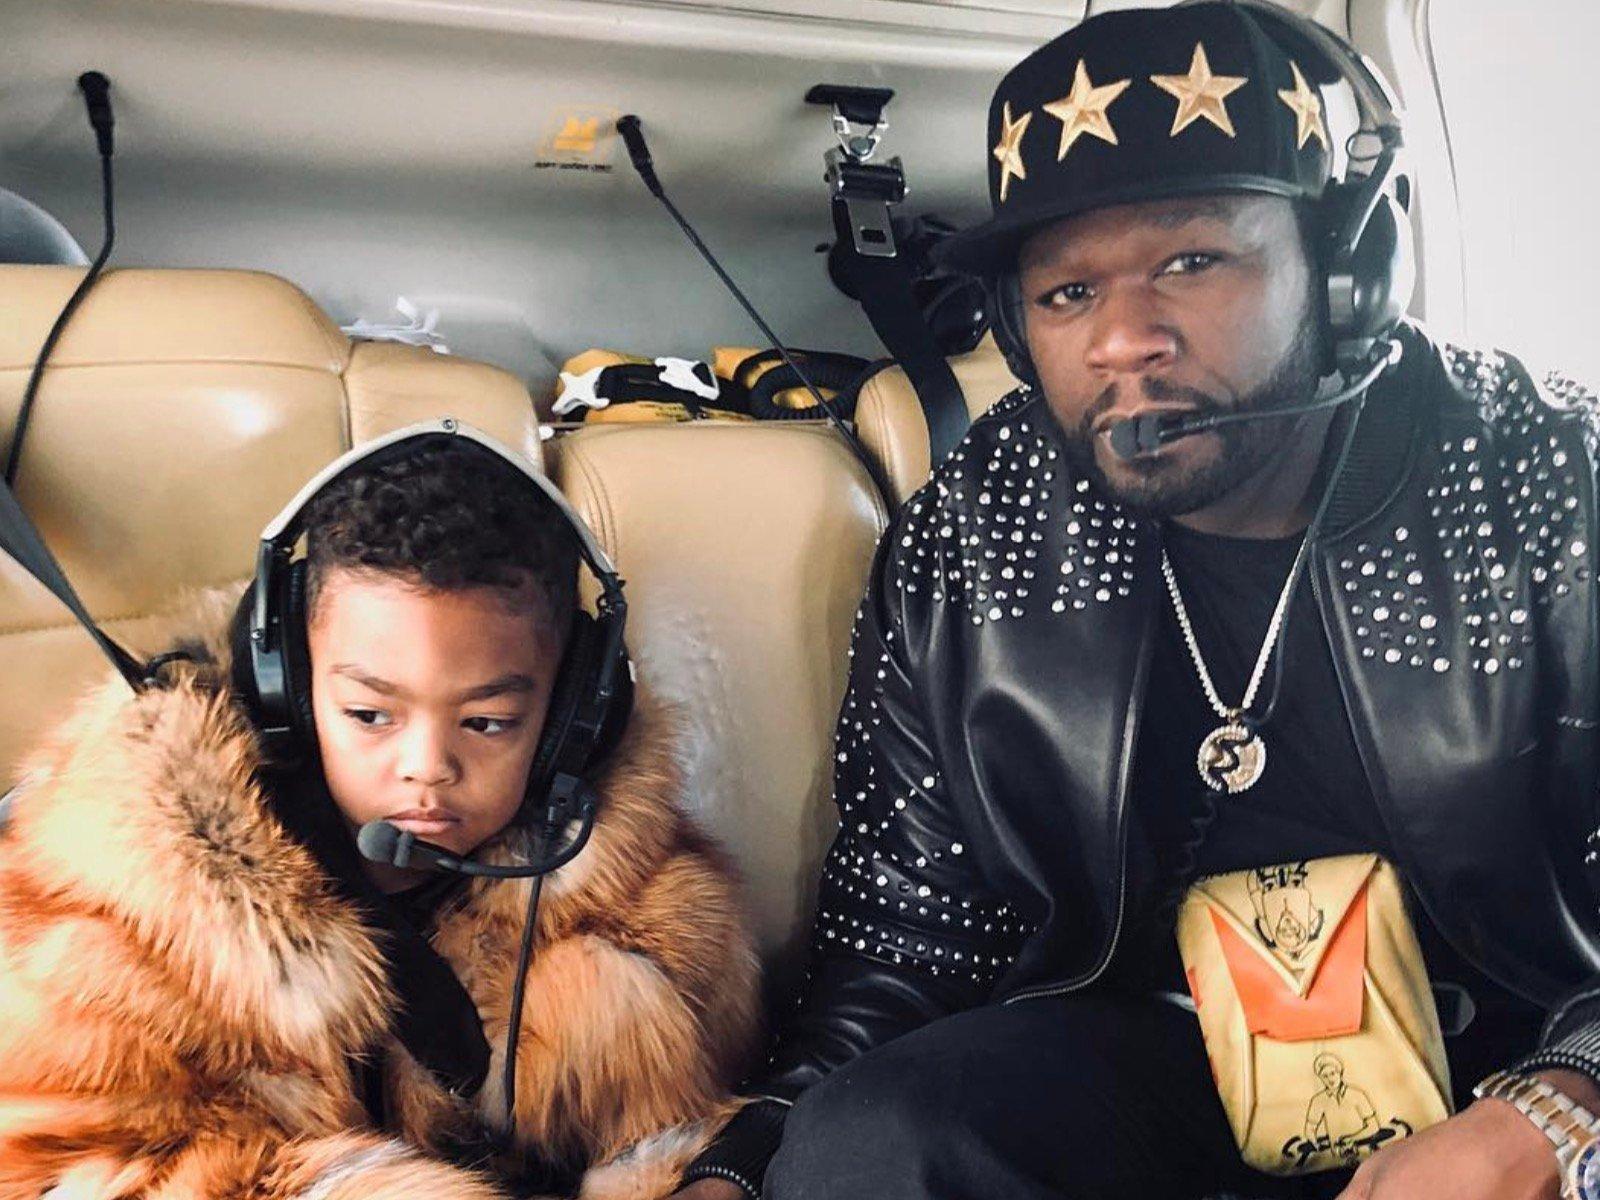 Sire Jackson 50 Cent